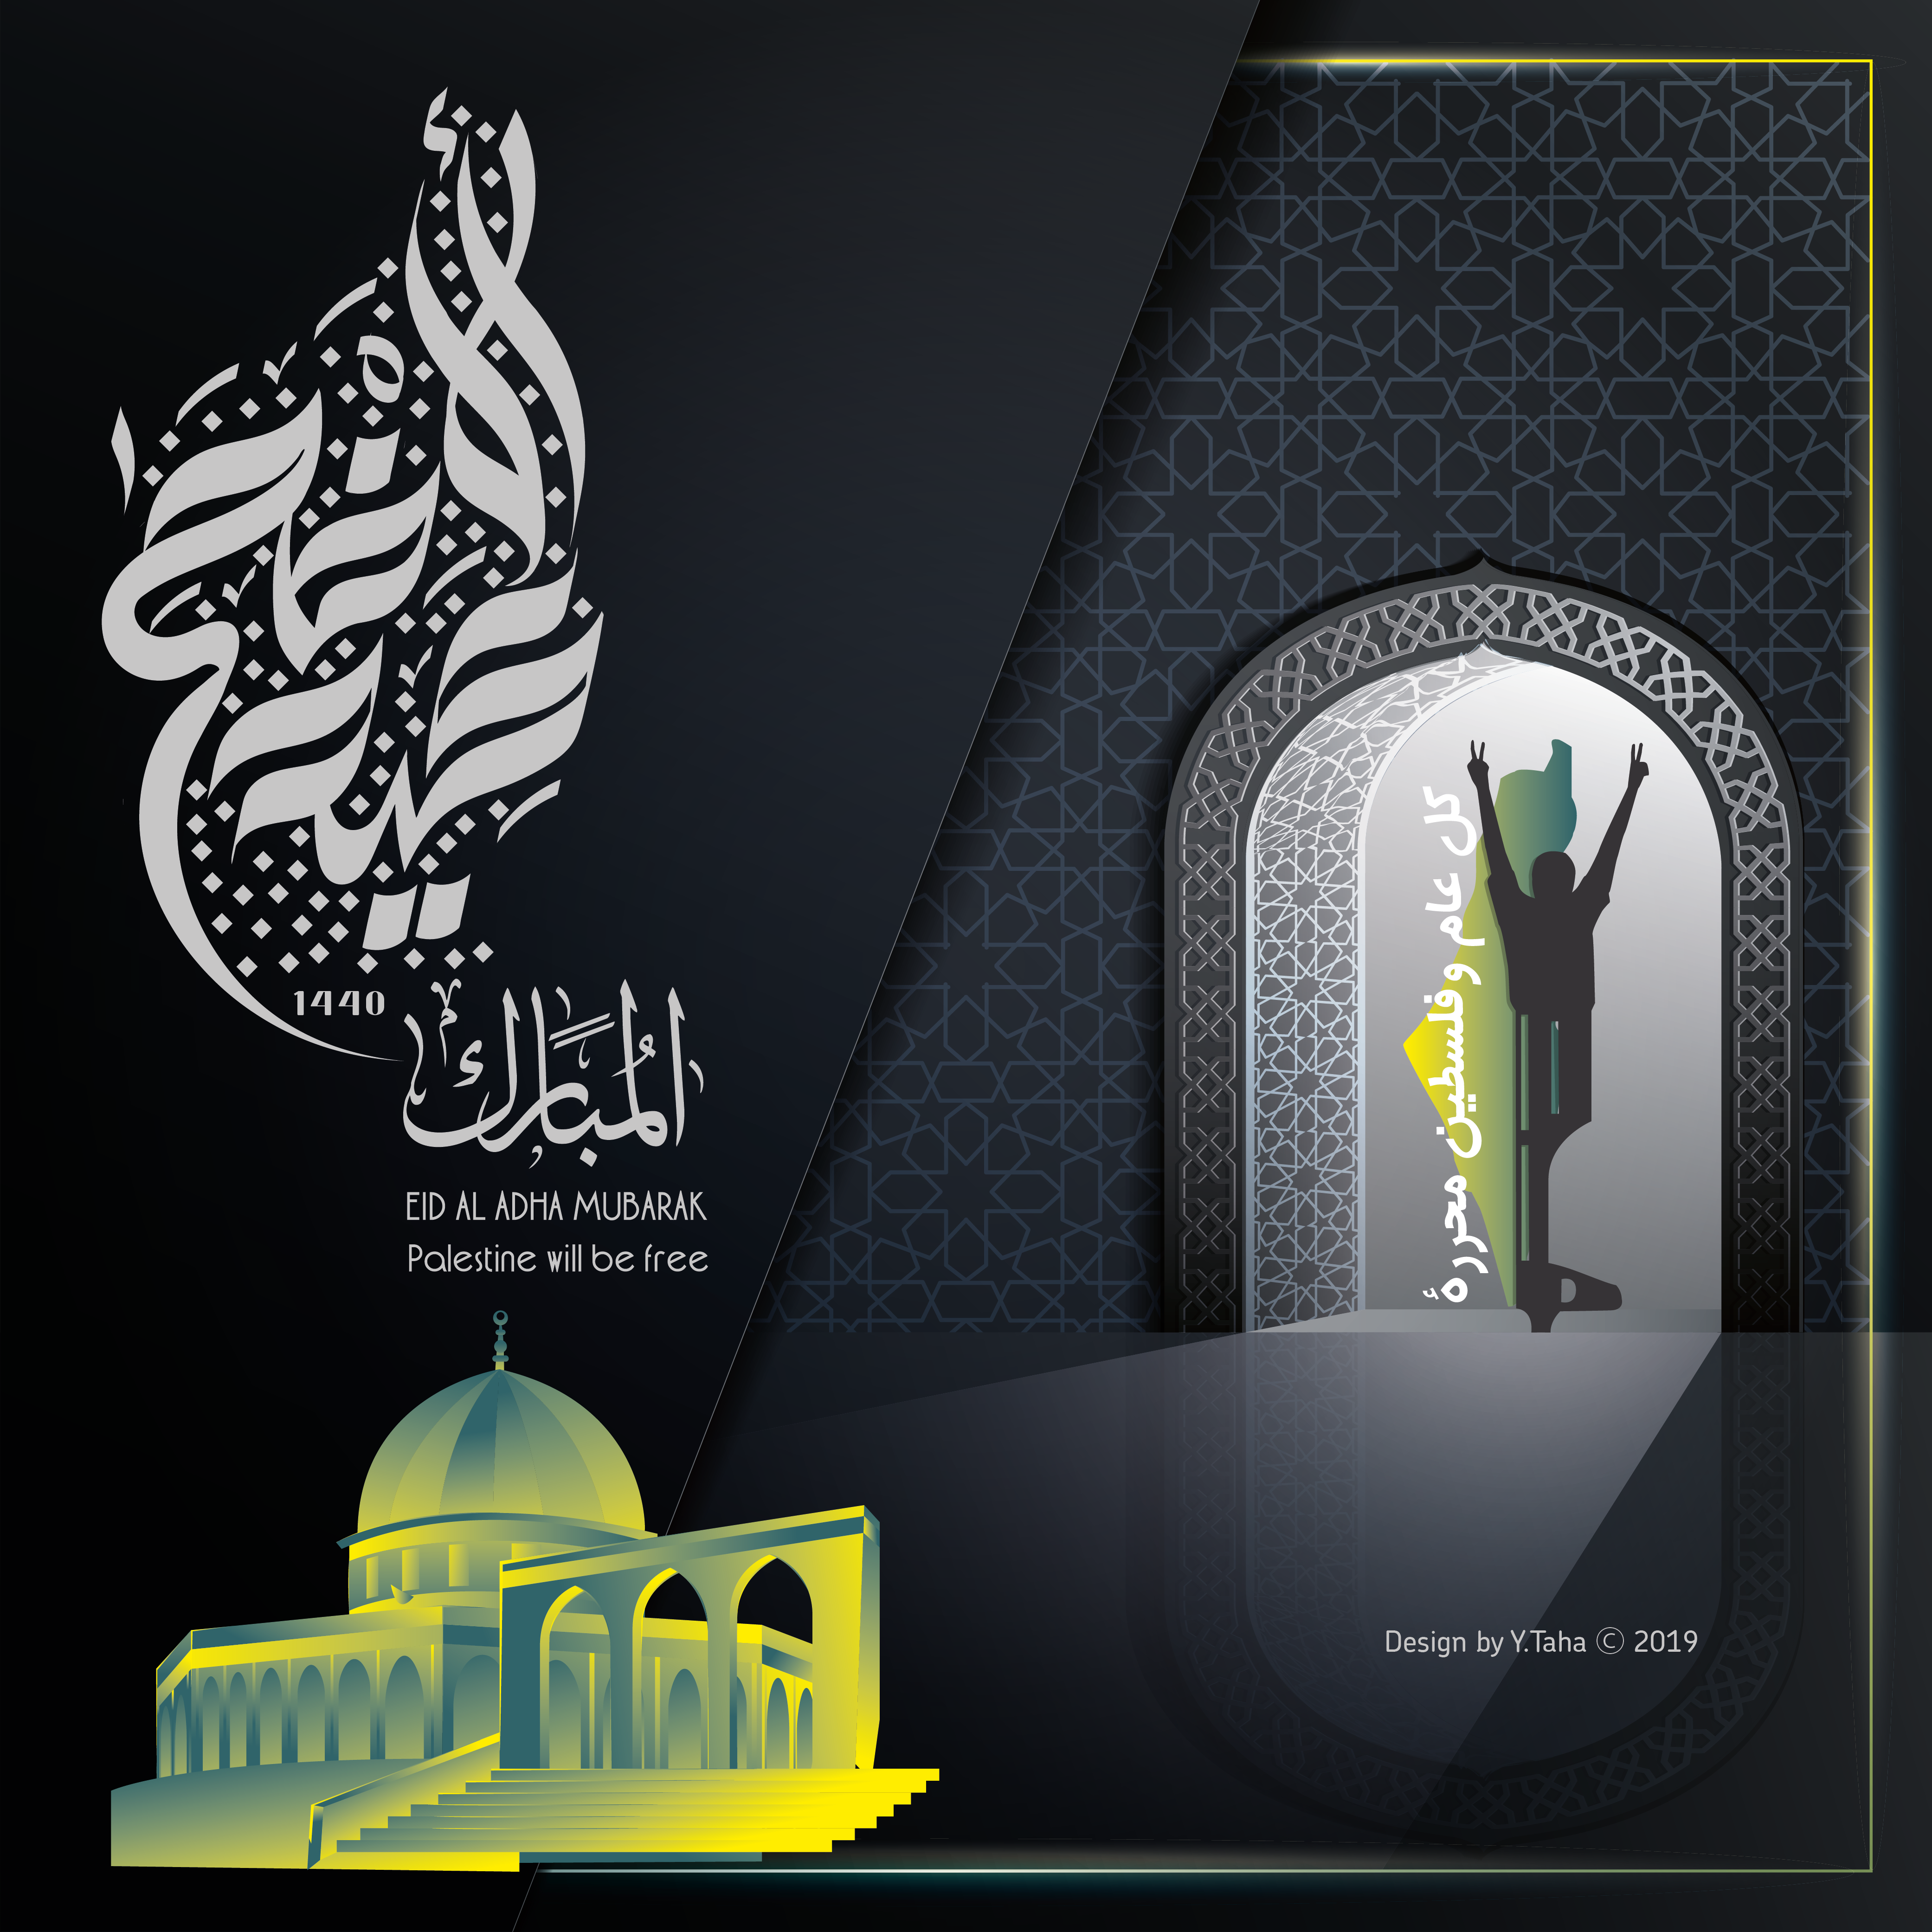 Eid Mubarak عيد أضحى مبارك Ein Gesegnetes Opferfest Happy El Adha Eid كل عام وانتم بخير بمناسبة عيد الاضحى المبارك كل ع Beautiful Places Poster Design